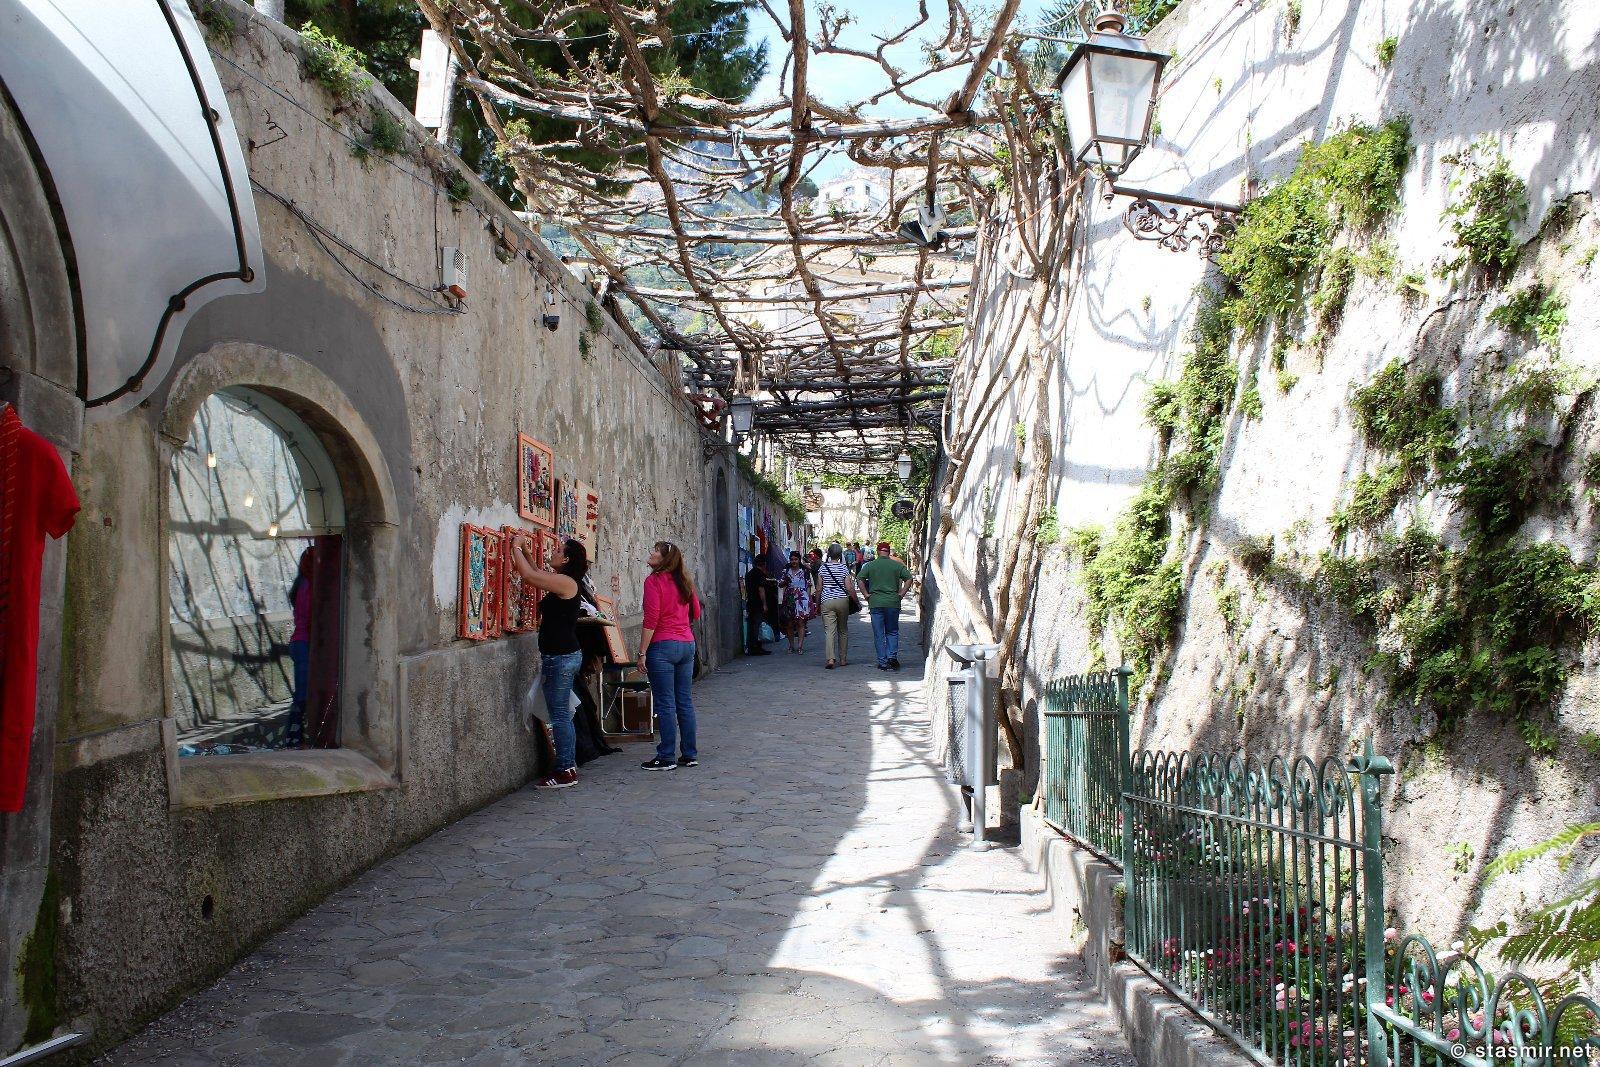 улицы Позитано, Фото Стасмир, photo Stasmir